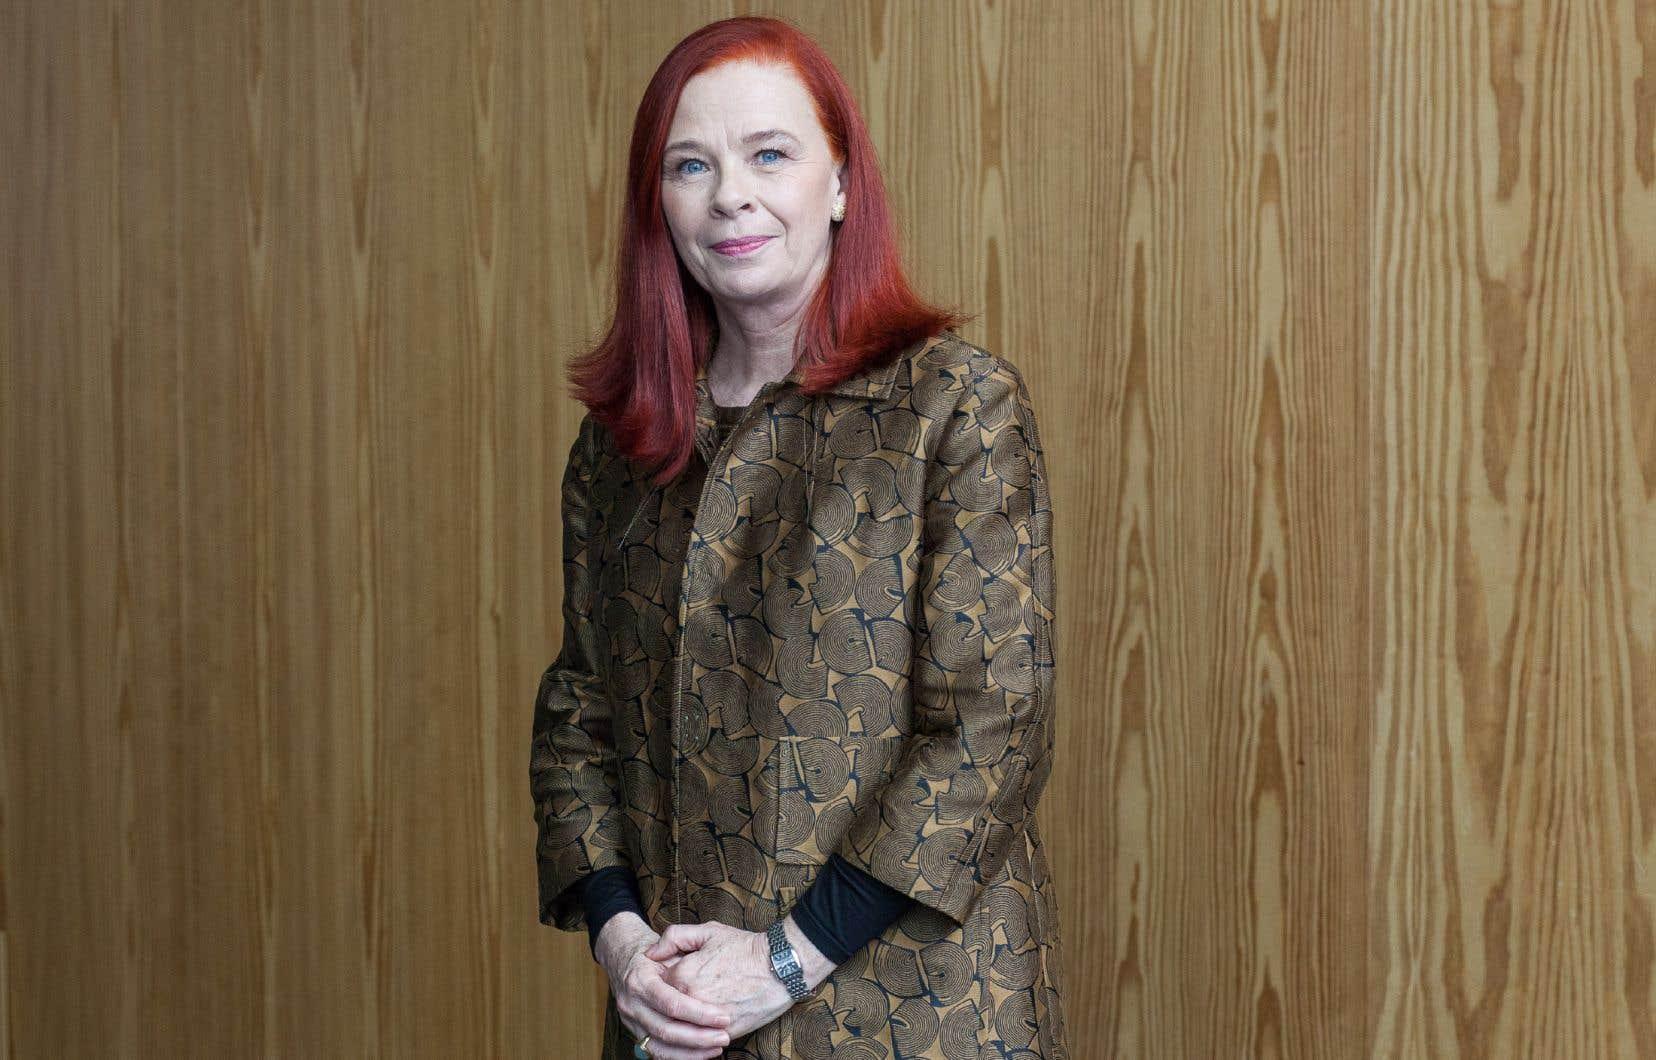 La présidente-directrice générale de CBC/Radio-Canada, Catherine Tait